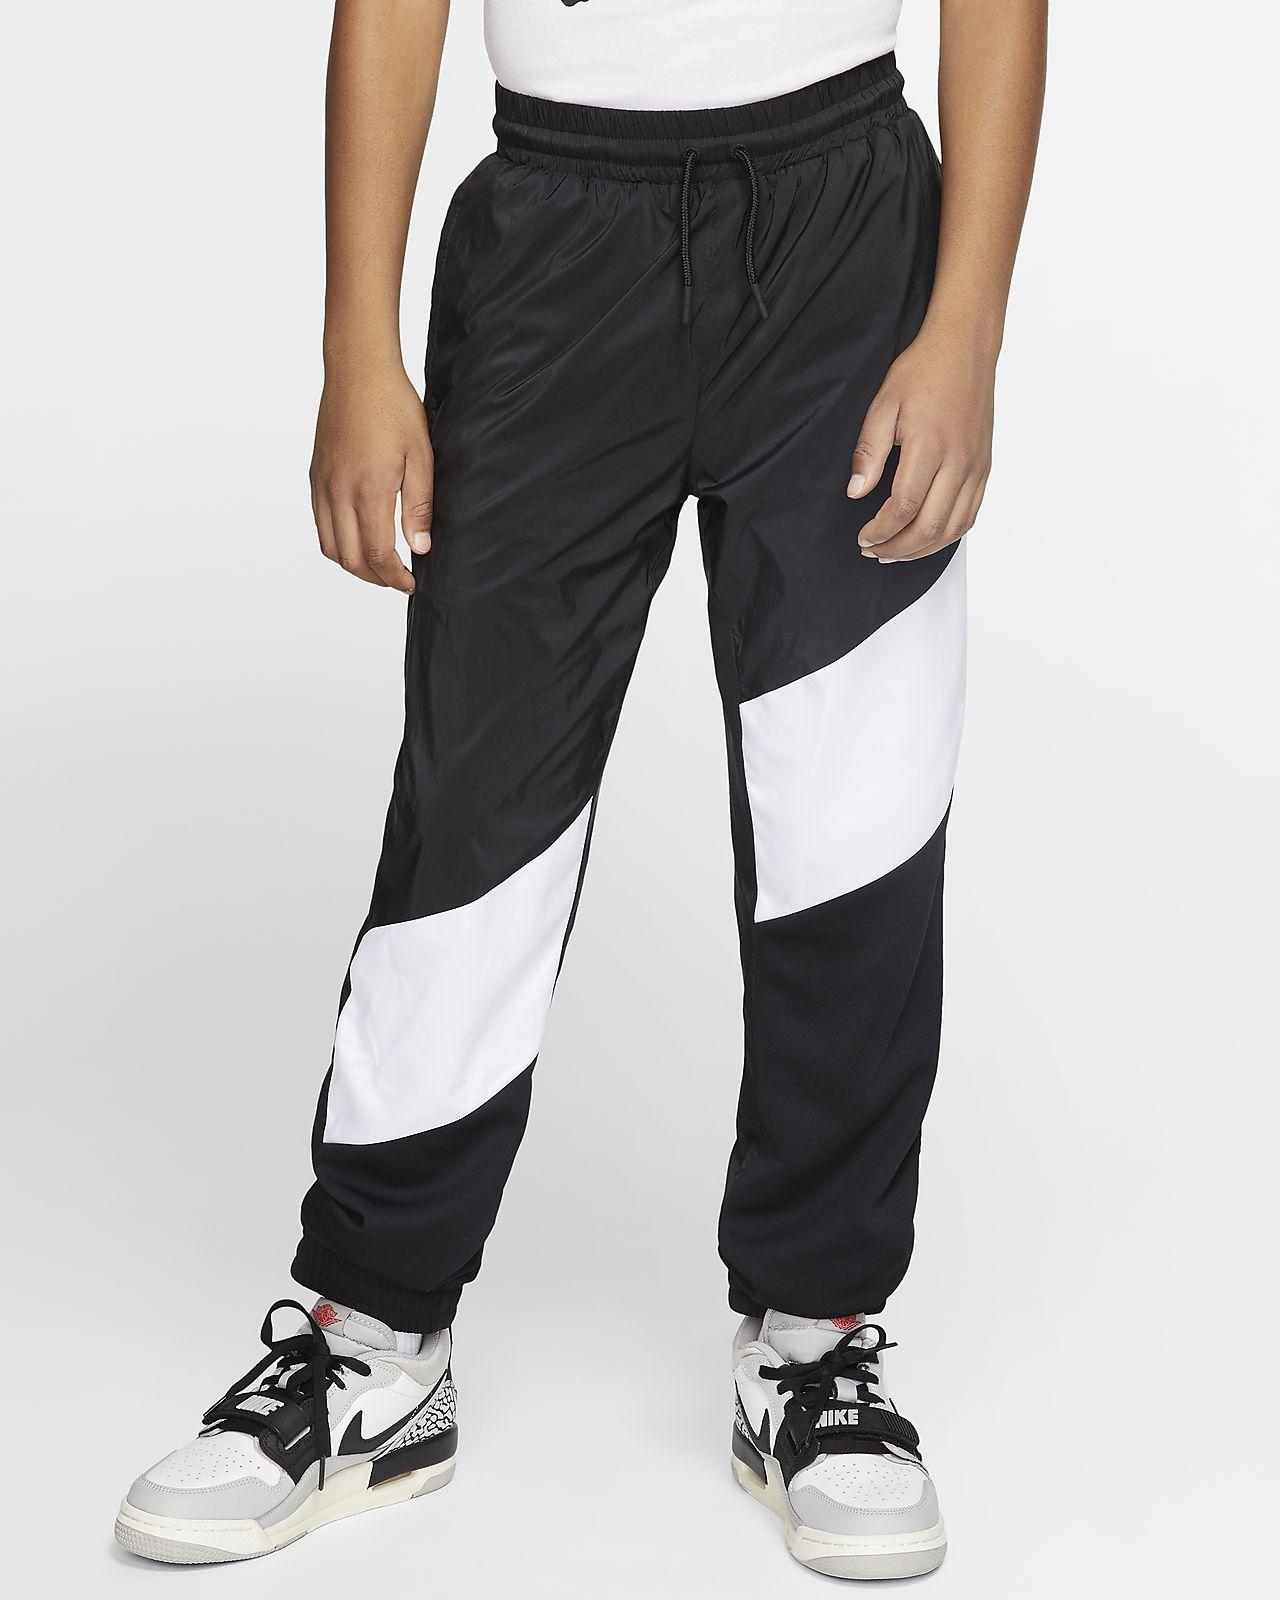 Jordan Wings Hose mit Bündchen für ältere Kinder (Jungen)